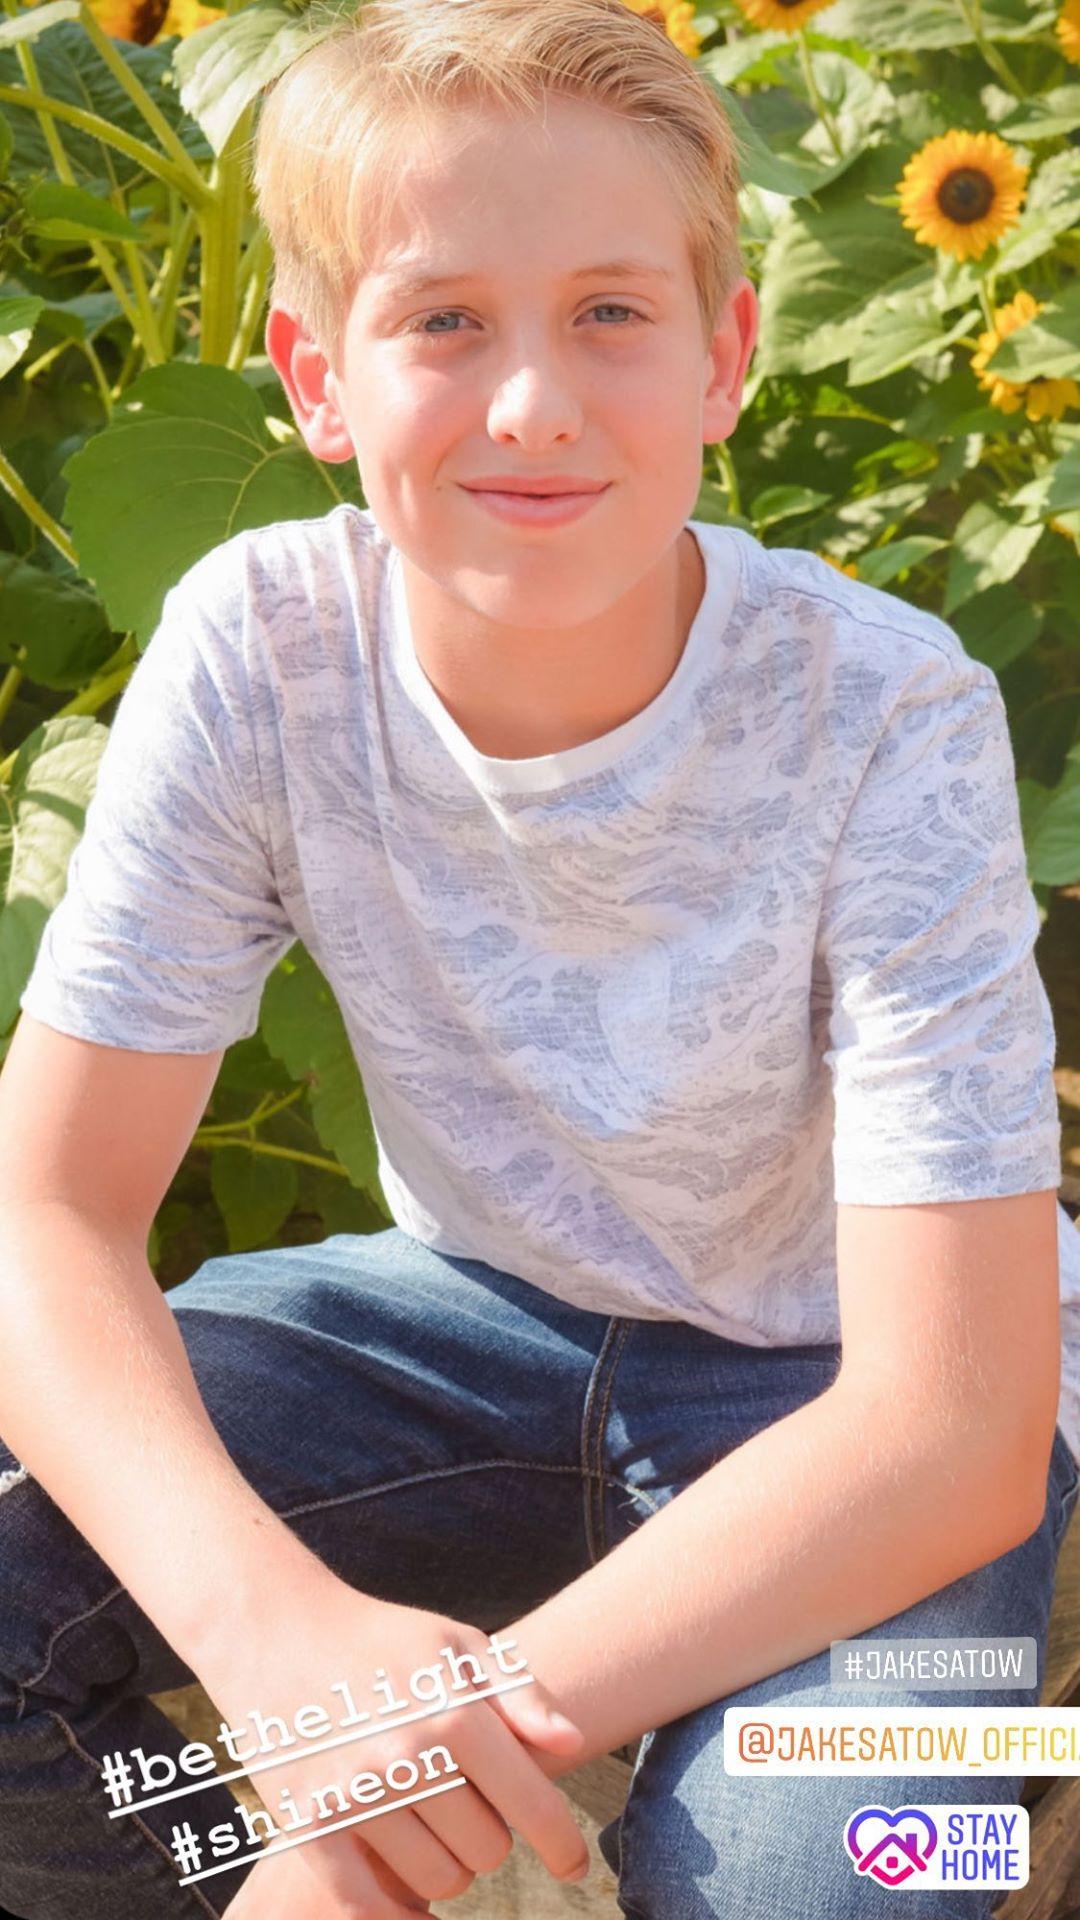 General photo of Jake Satow